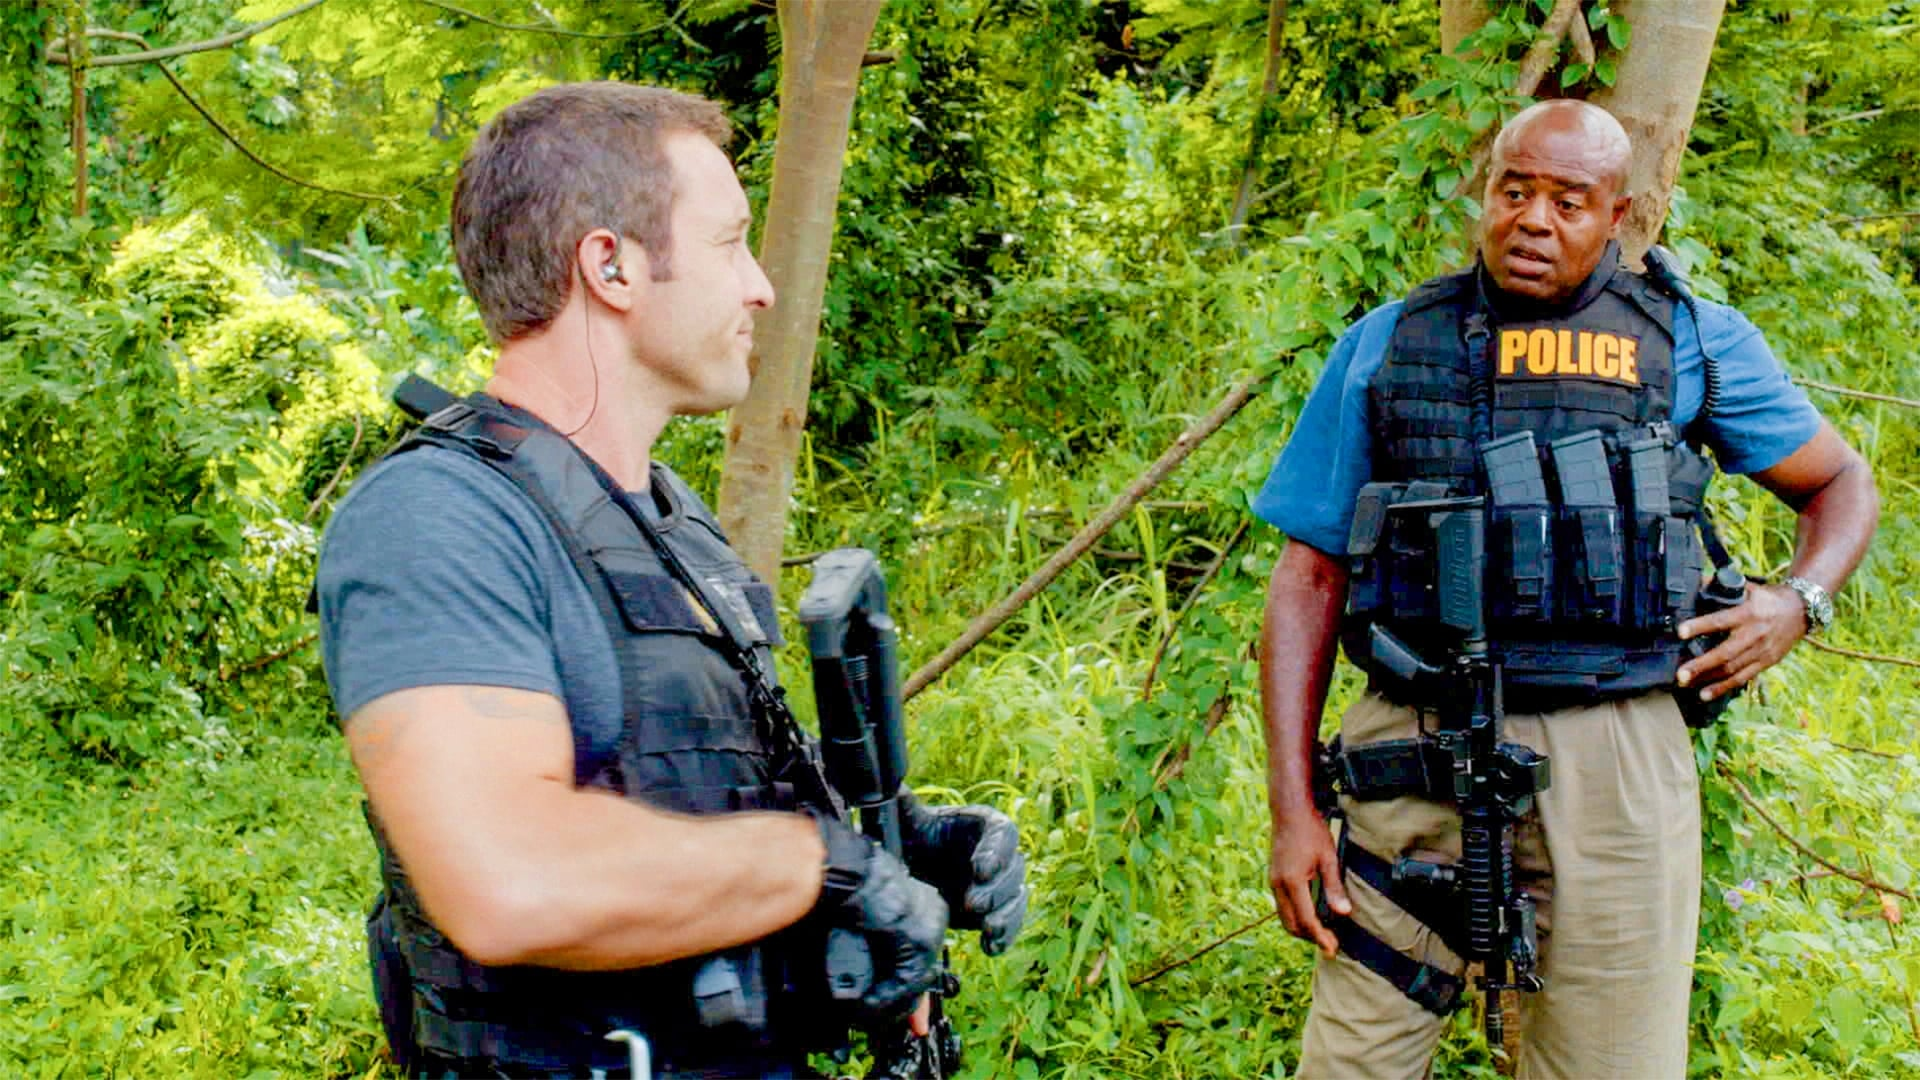 Hawaii Five-0 - Season 4 Episode 12 : O Kela Me Keia Manawa